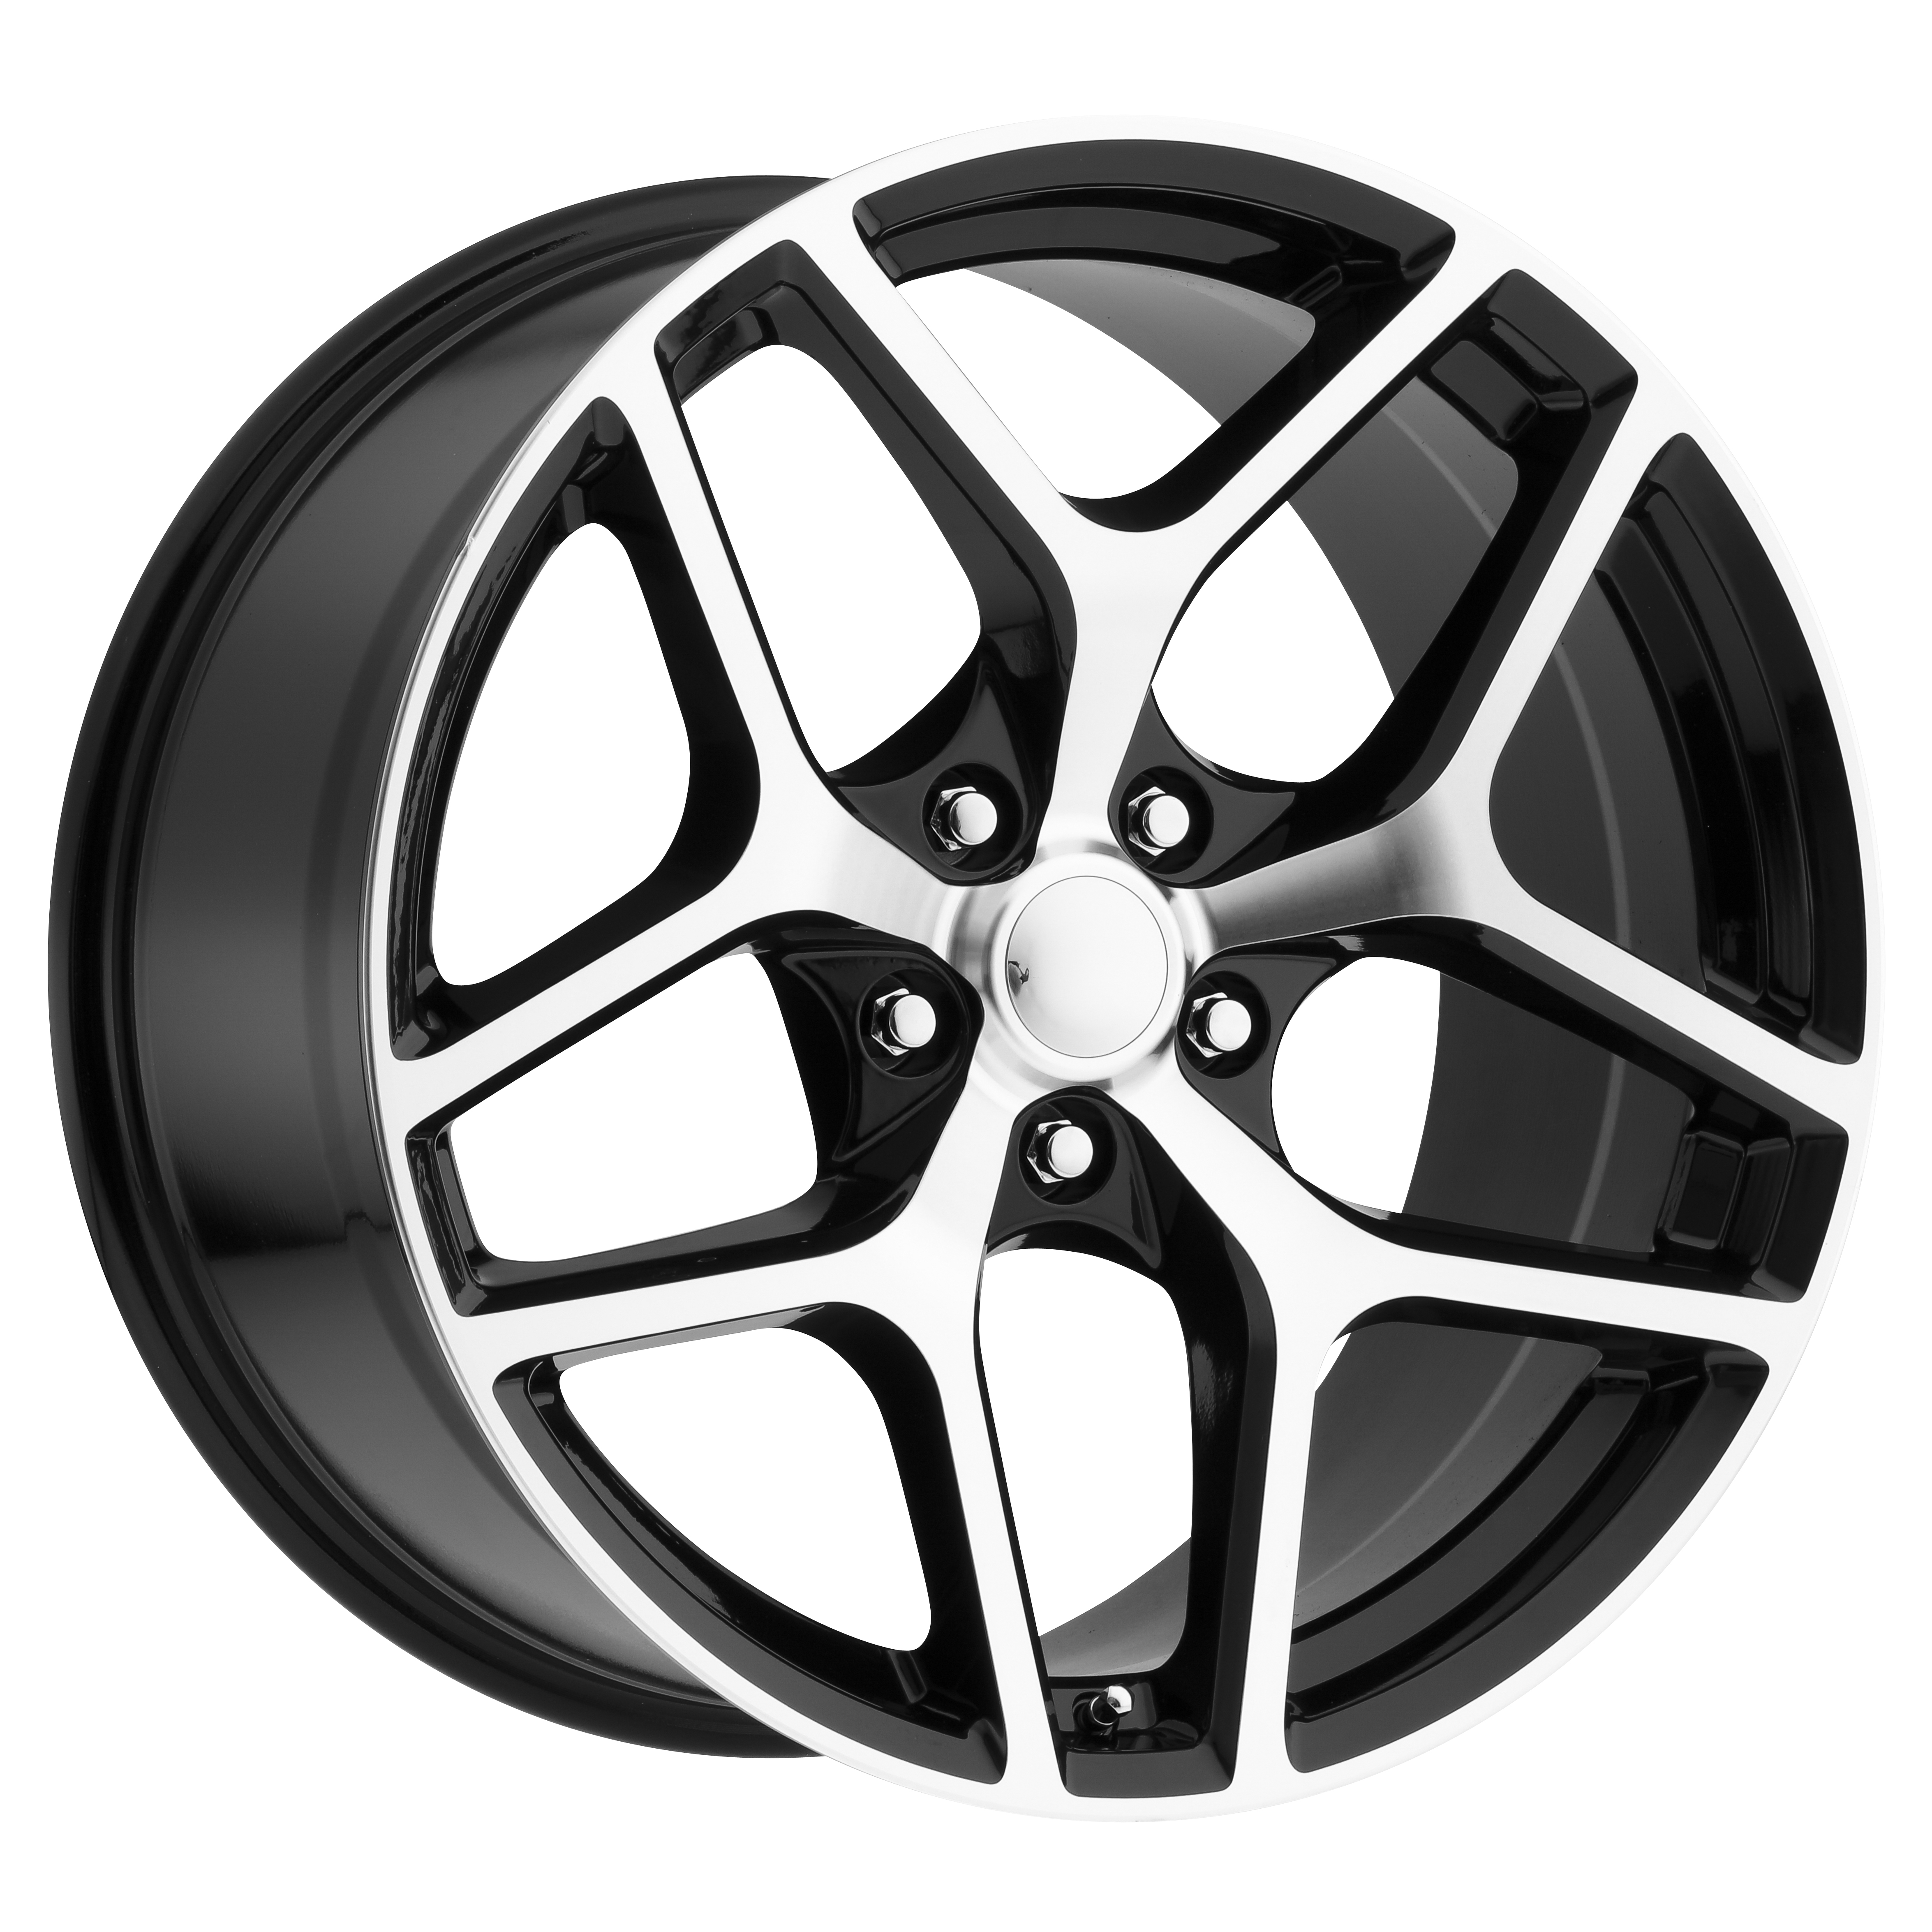 chevrolet camaro z28 black machined face replicas wheels jk LQ4 Camaro chevrolet camaro z28 black machined face replicas